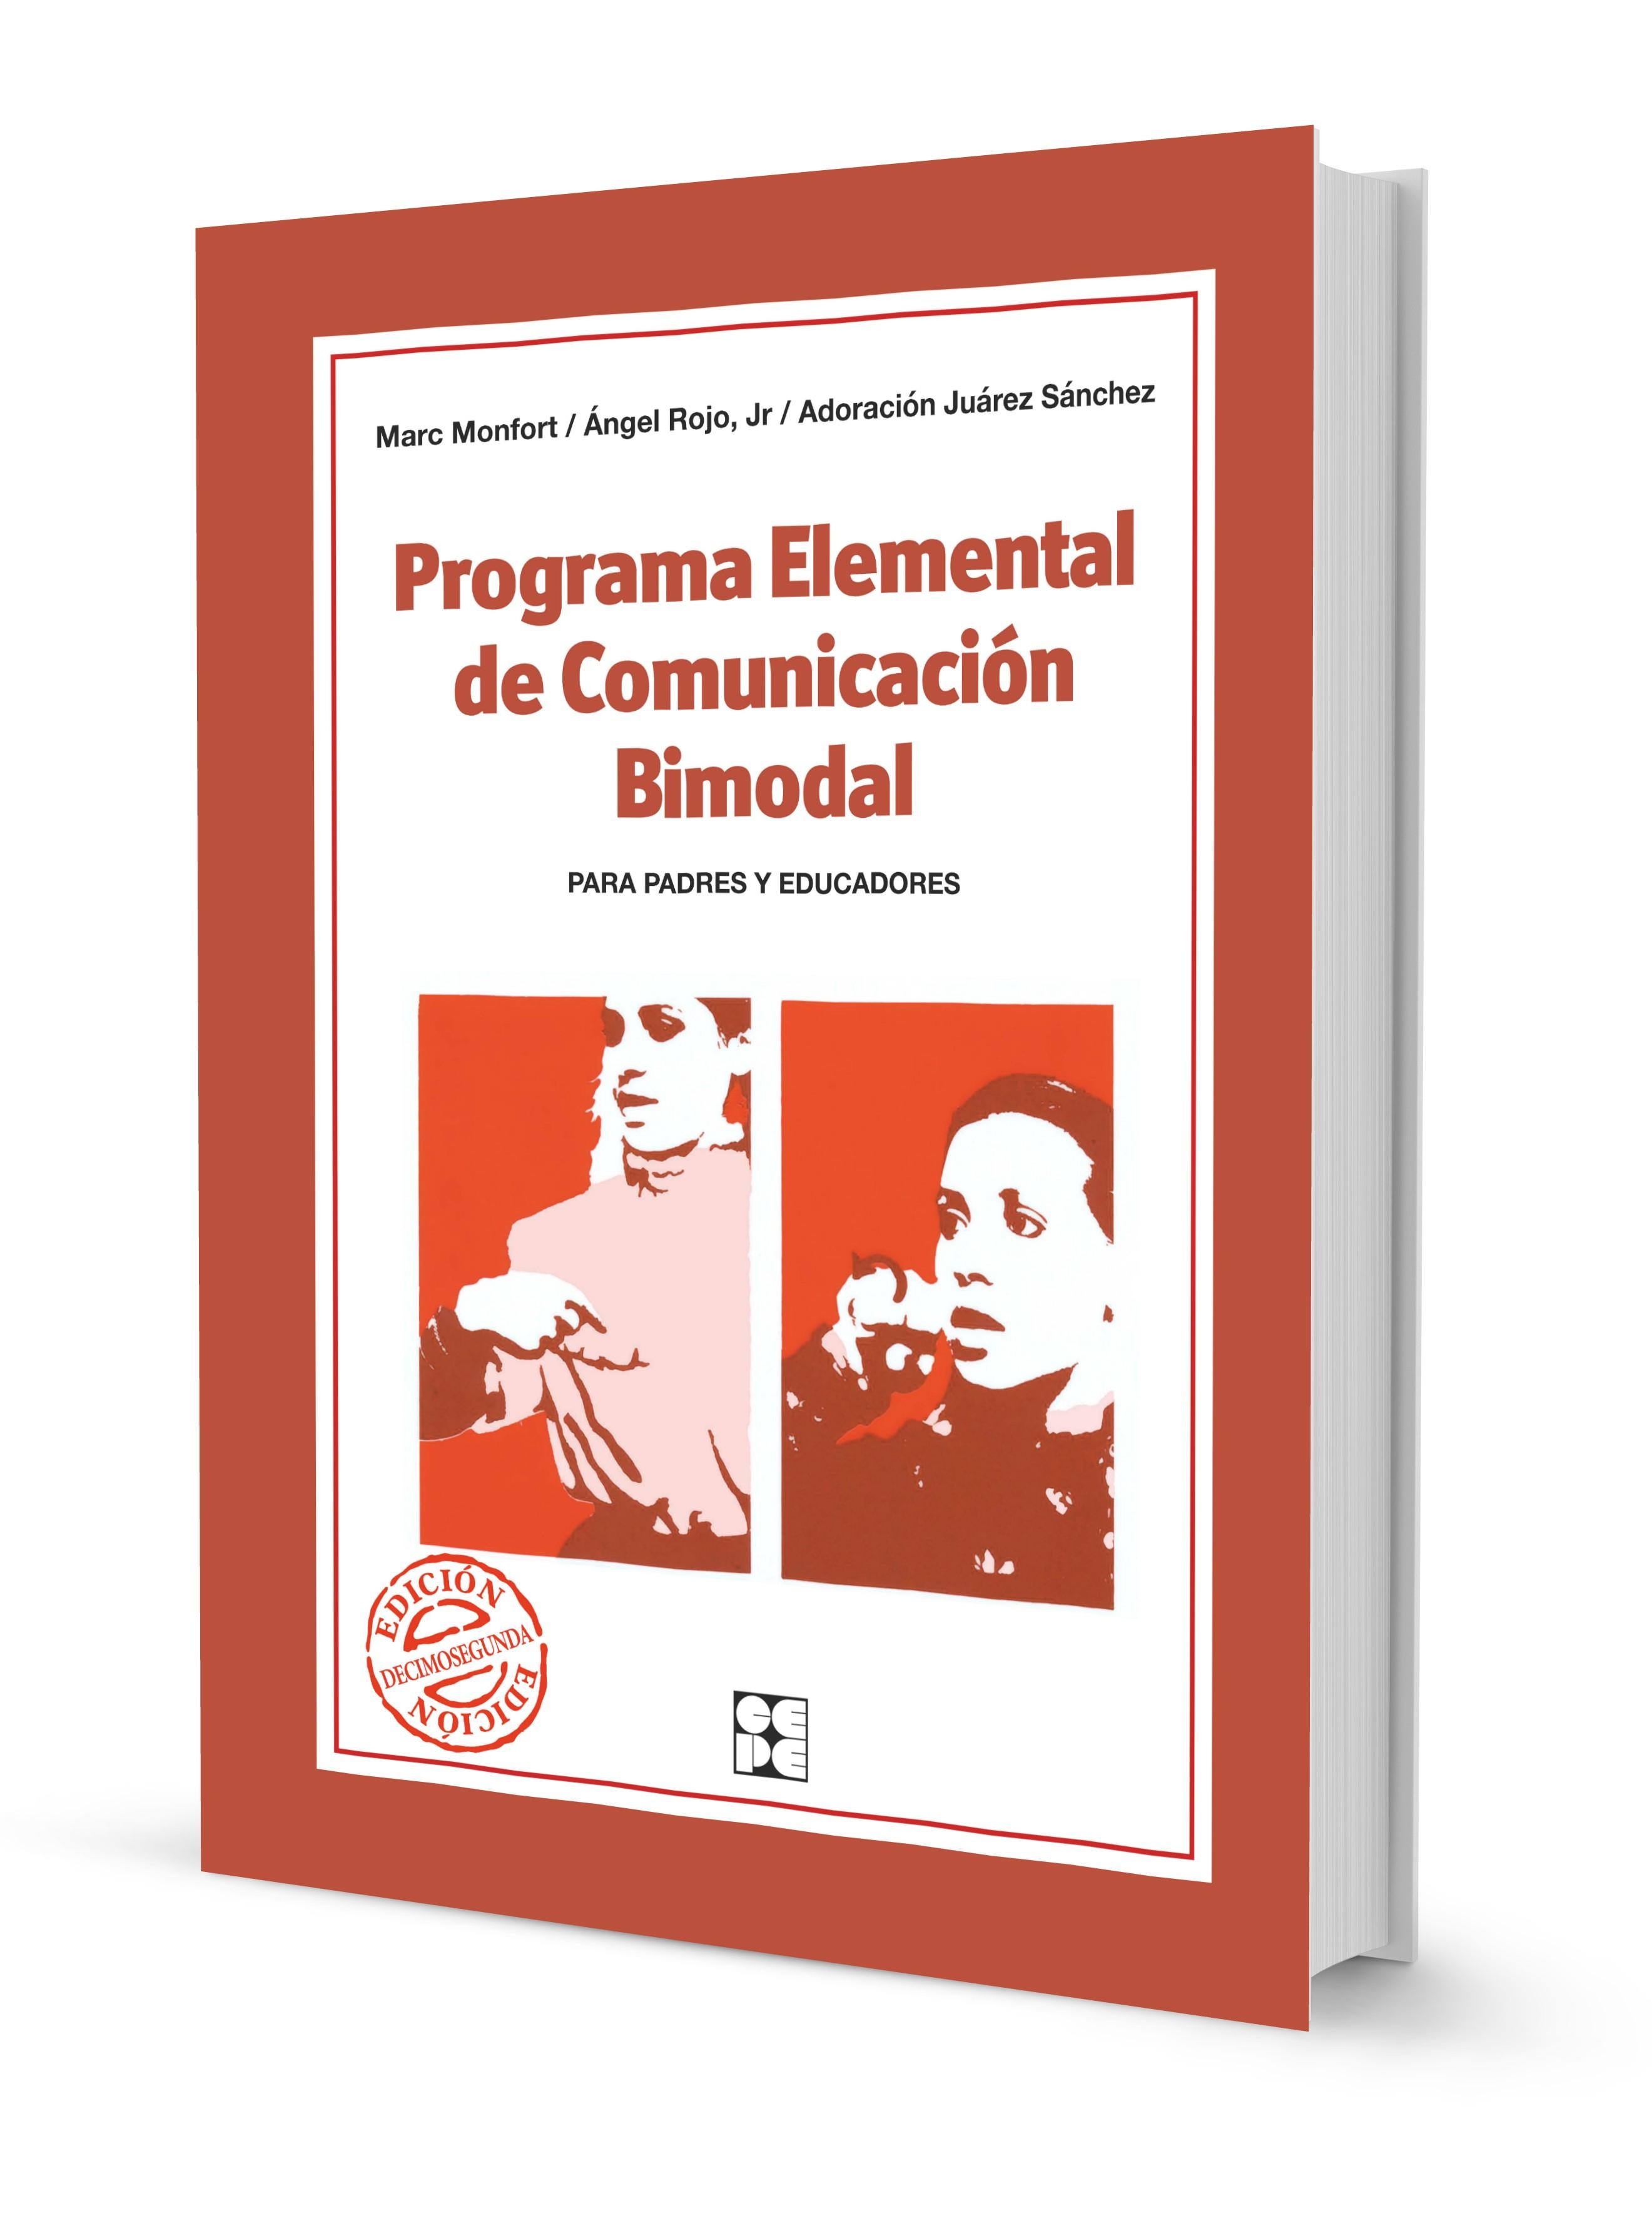 Programa Elemental de Comunicación Bimodal. Para padres y educadores